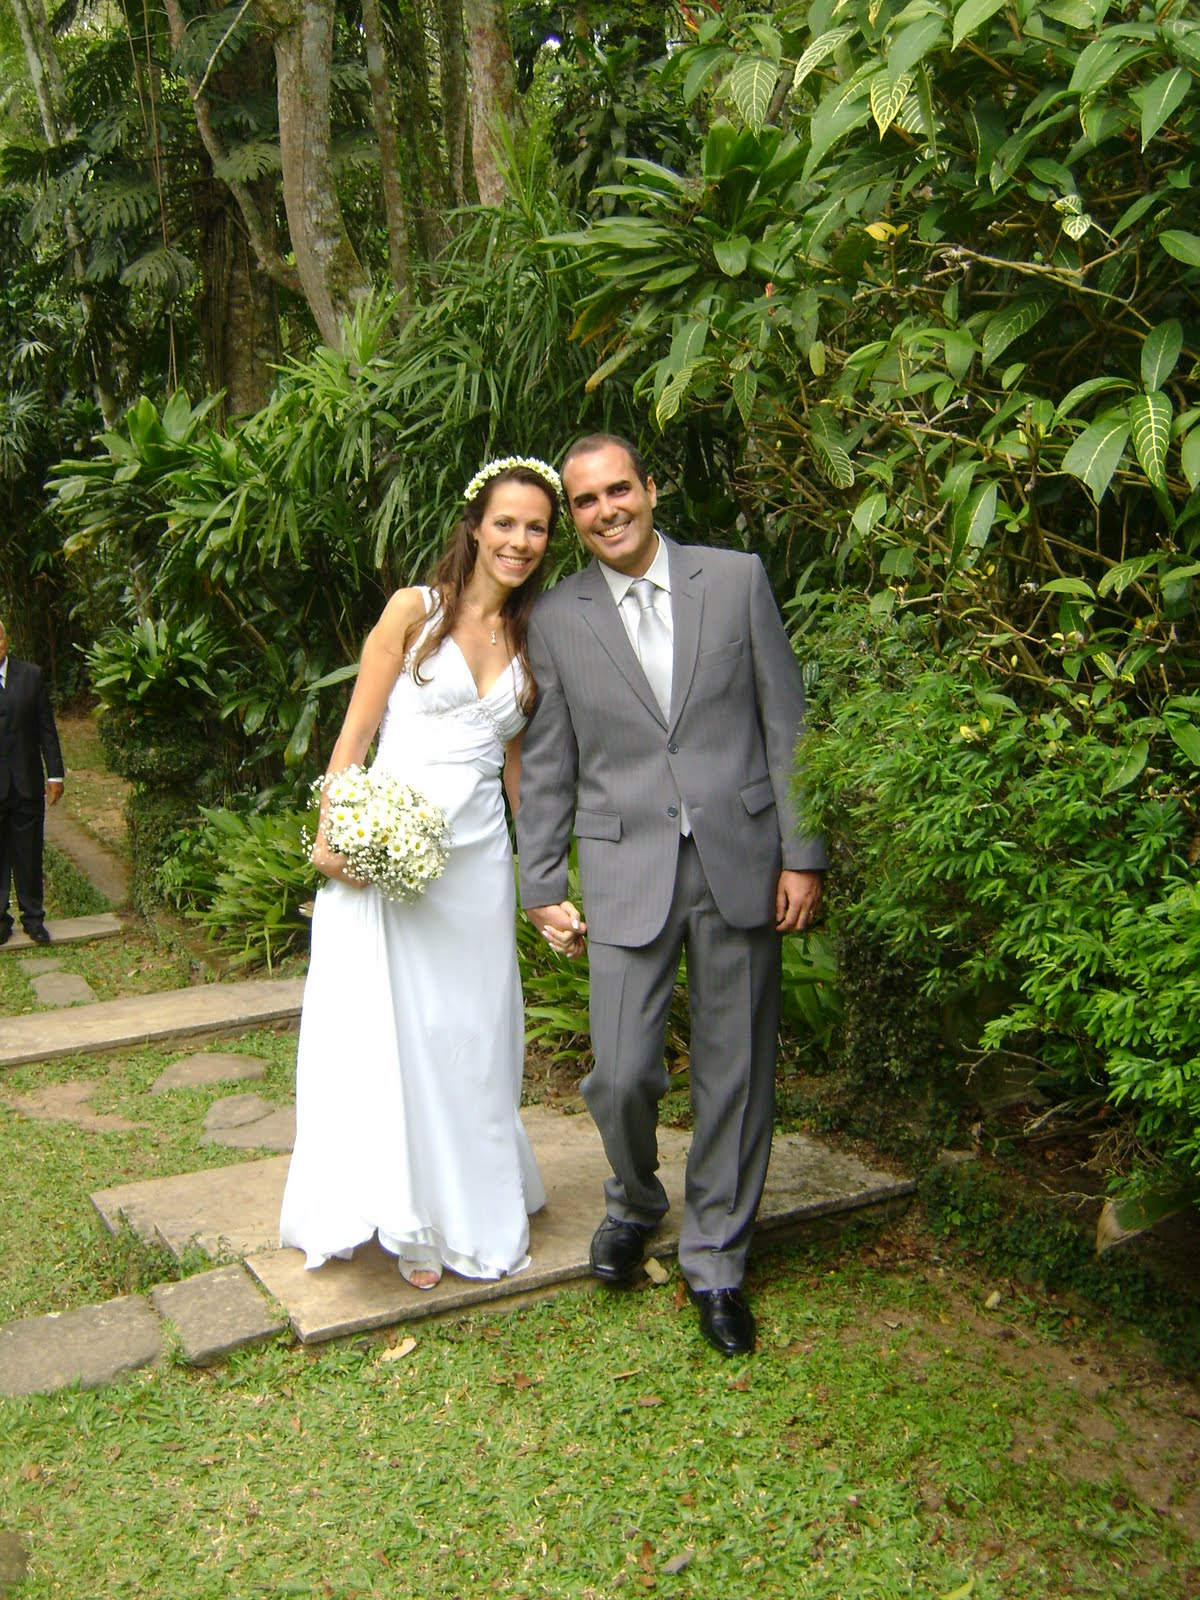 Os esquilos restaurante rosi e renato for Renato portaluppi e casado